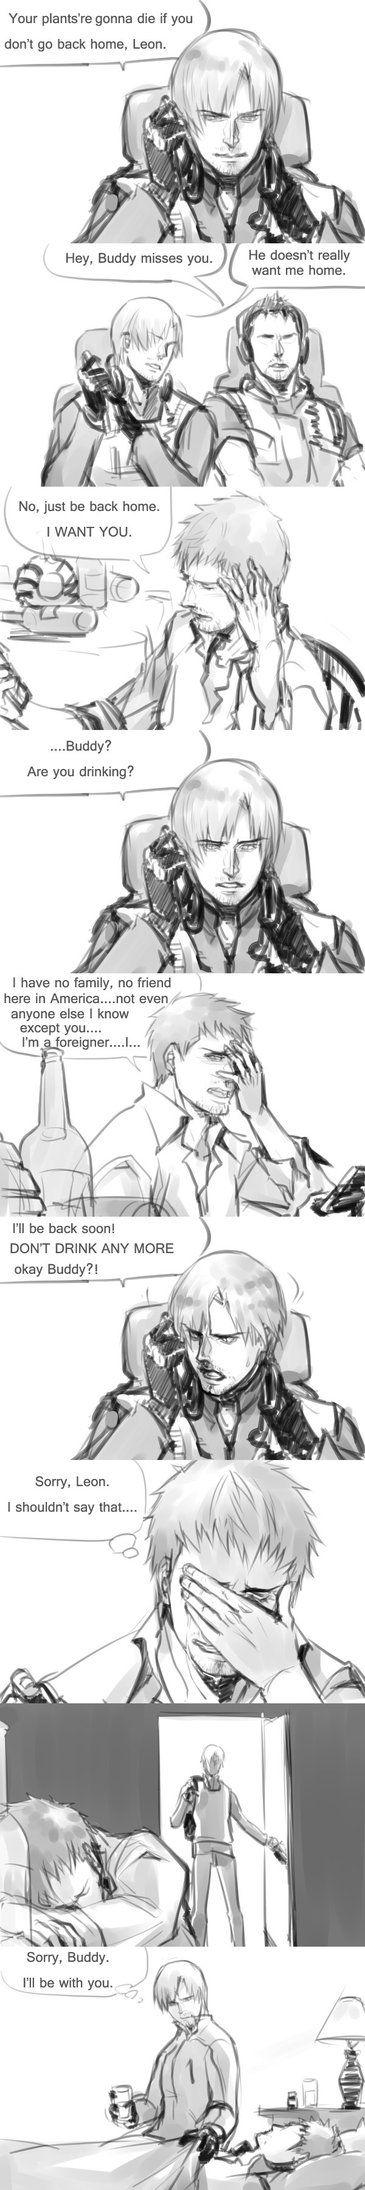 [Resident Evil:Damnation]Leon/Buddy small comics.. by eilinna on DeviantArt